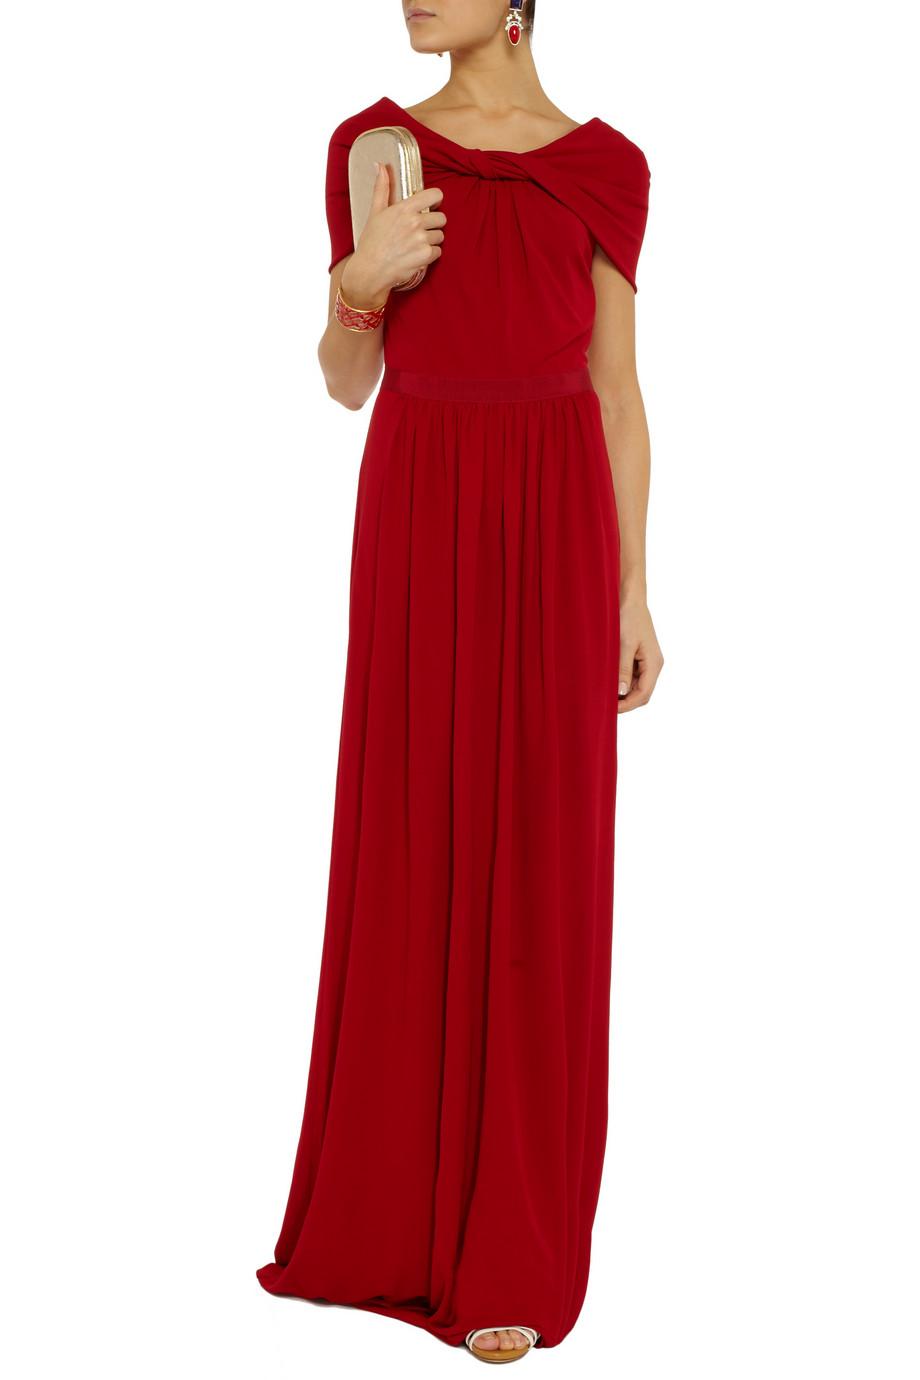 Giambattista Valli Draped Stretch Crepejersey Gown in Red - Lyst 36e366cd8